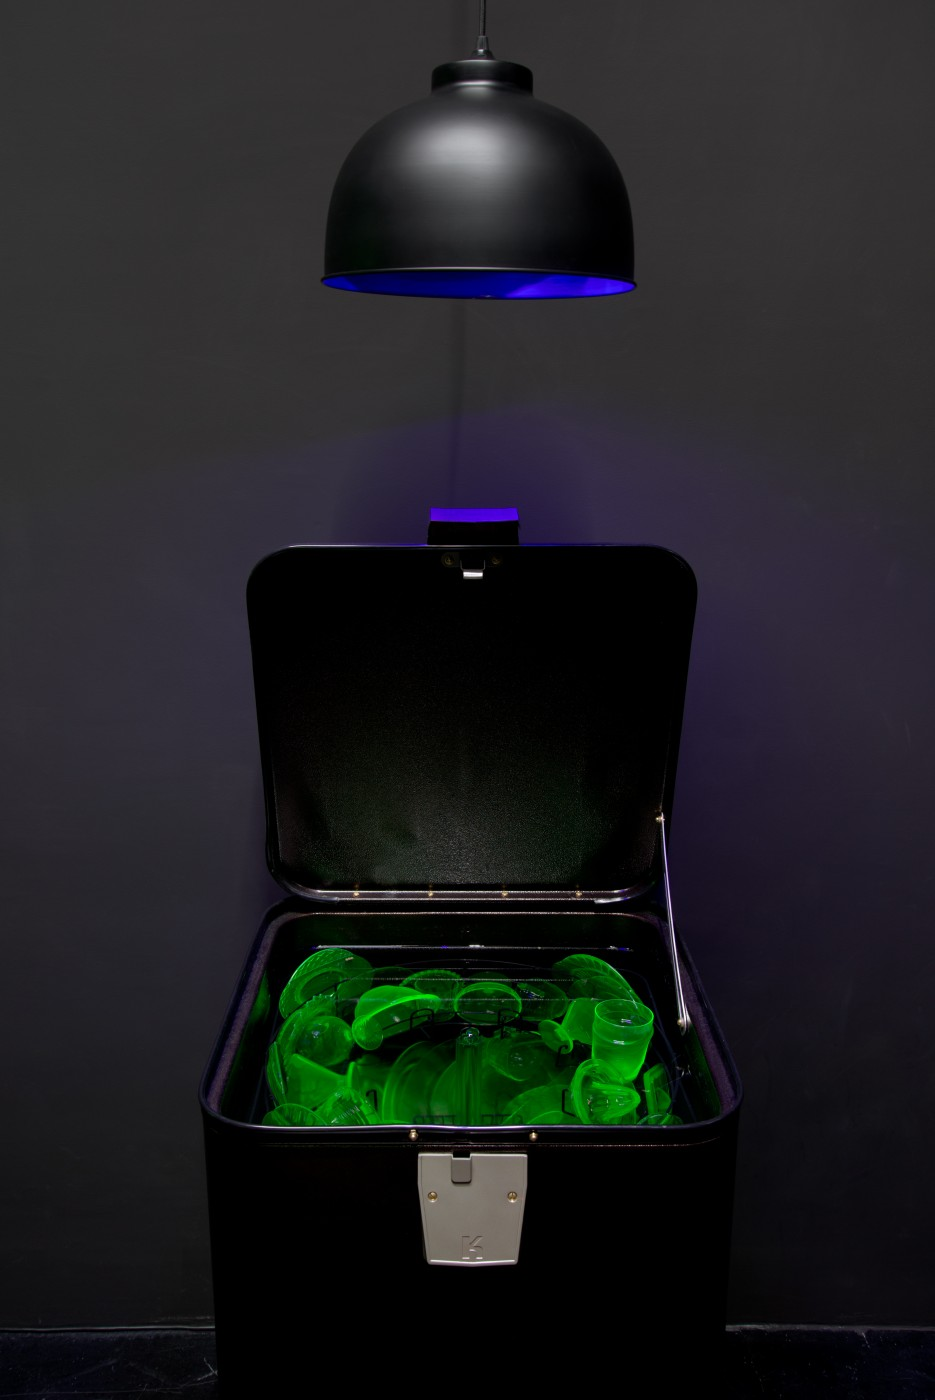 NATURE THEATER OF VIOLENT SUCCESSION  Cold War Dishwasher (Uranium Glass)</I>, 2015 (detail) Vintage refurbished Kenmore dishwasher, assorted uranium glass dishware, live freshwater ecosystem, sump tank, biological filter pump, crushed glass substrate, Danionin sp. fish, blacklight hood lamp  134 x 52 x 36 cm / 52.8 x 20.5 x 14.2 in  MAX HOOPER SCHNEIDER